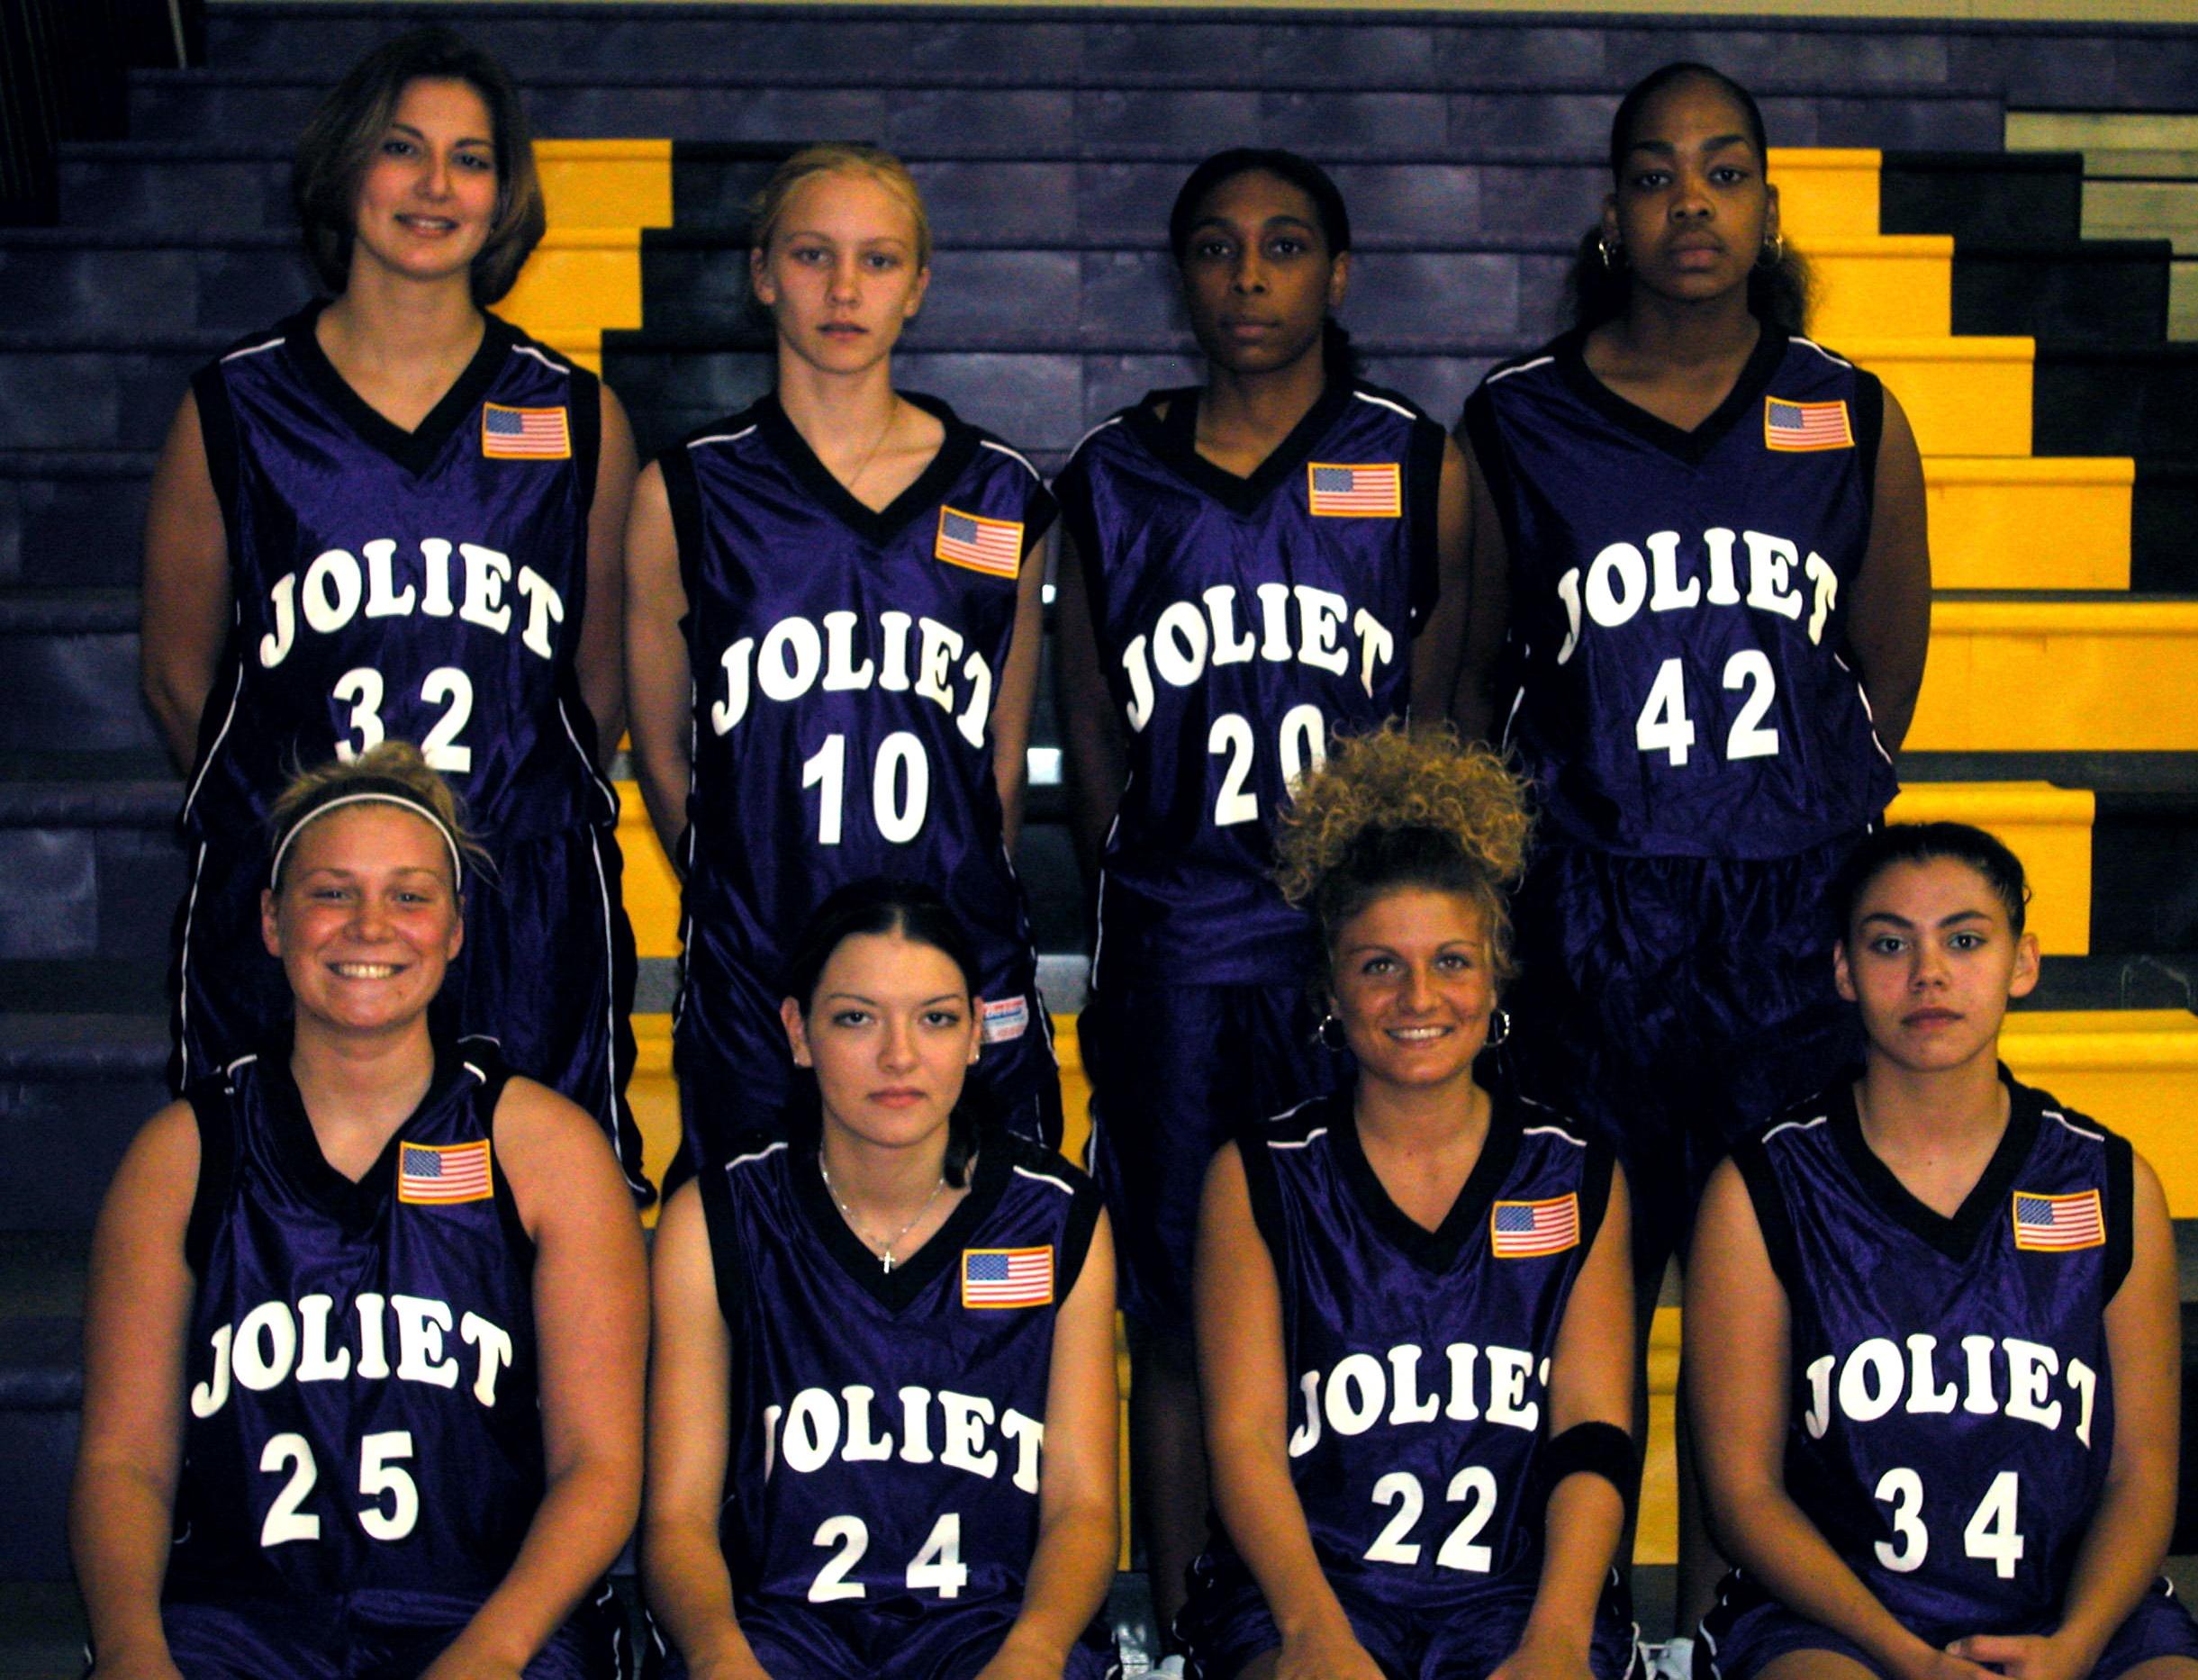 2003-2004 JJC Women's Basketball Celebrating 115 years at Joliet Junior College